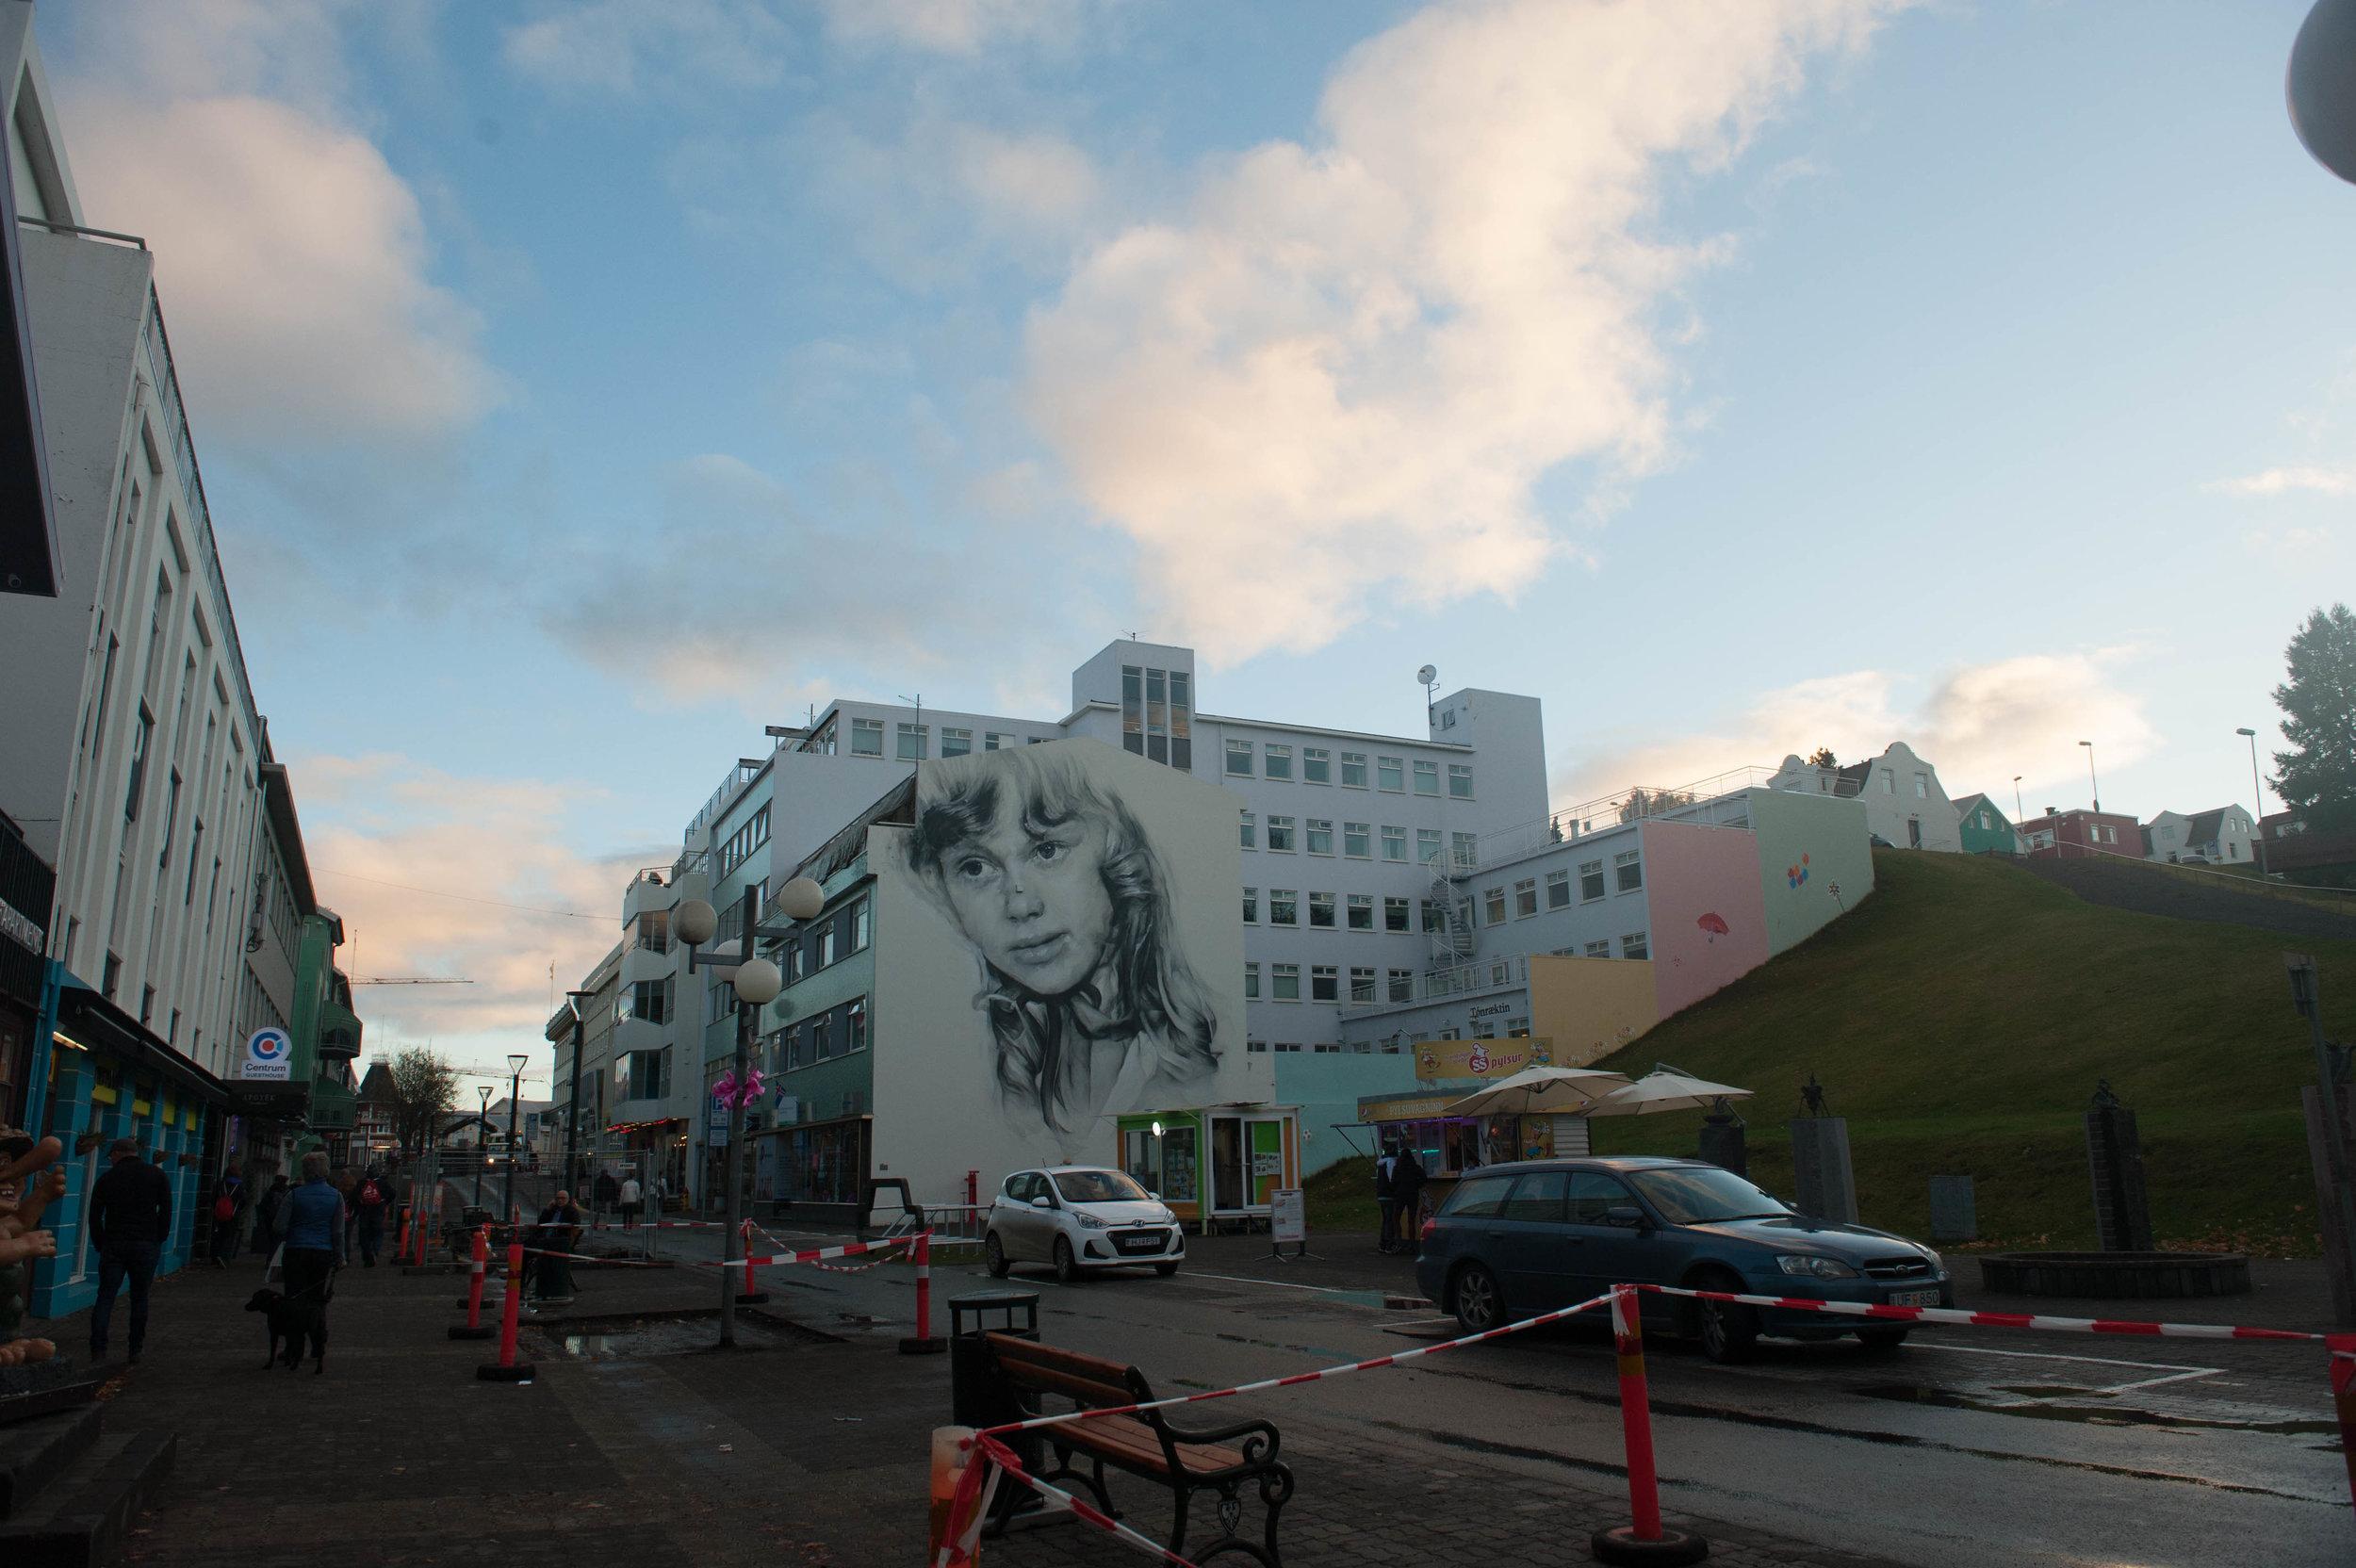 Iceland Honeymoon-92.jpg